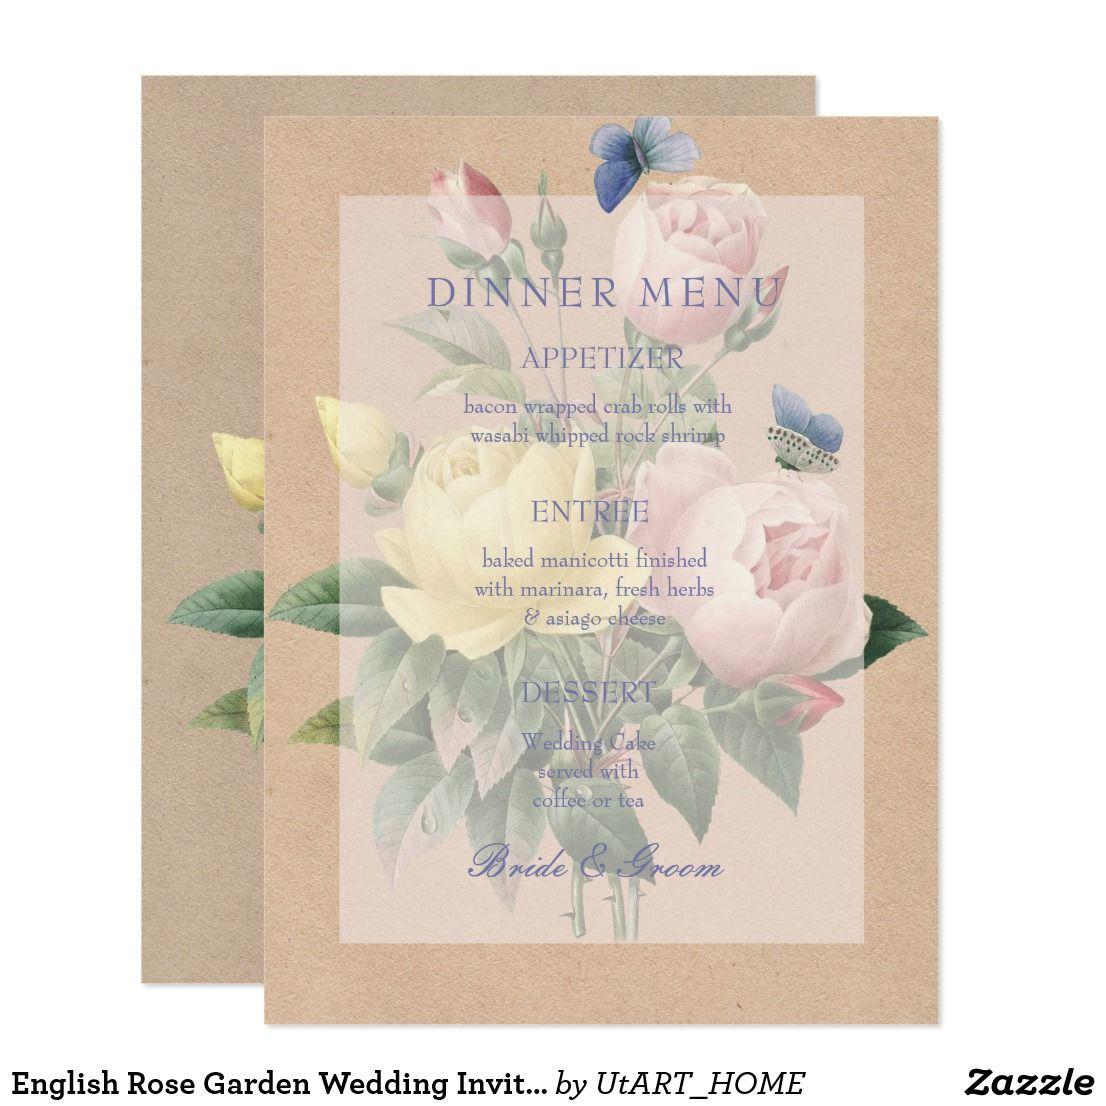 English Rose Garden Wedding Invitation Menu